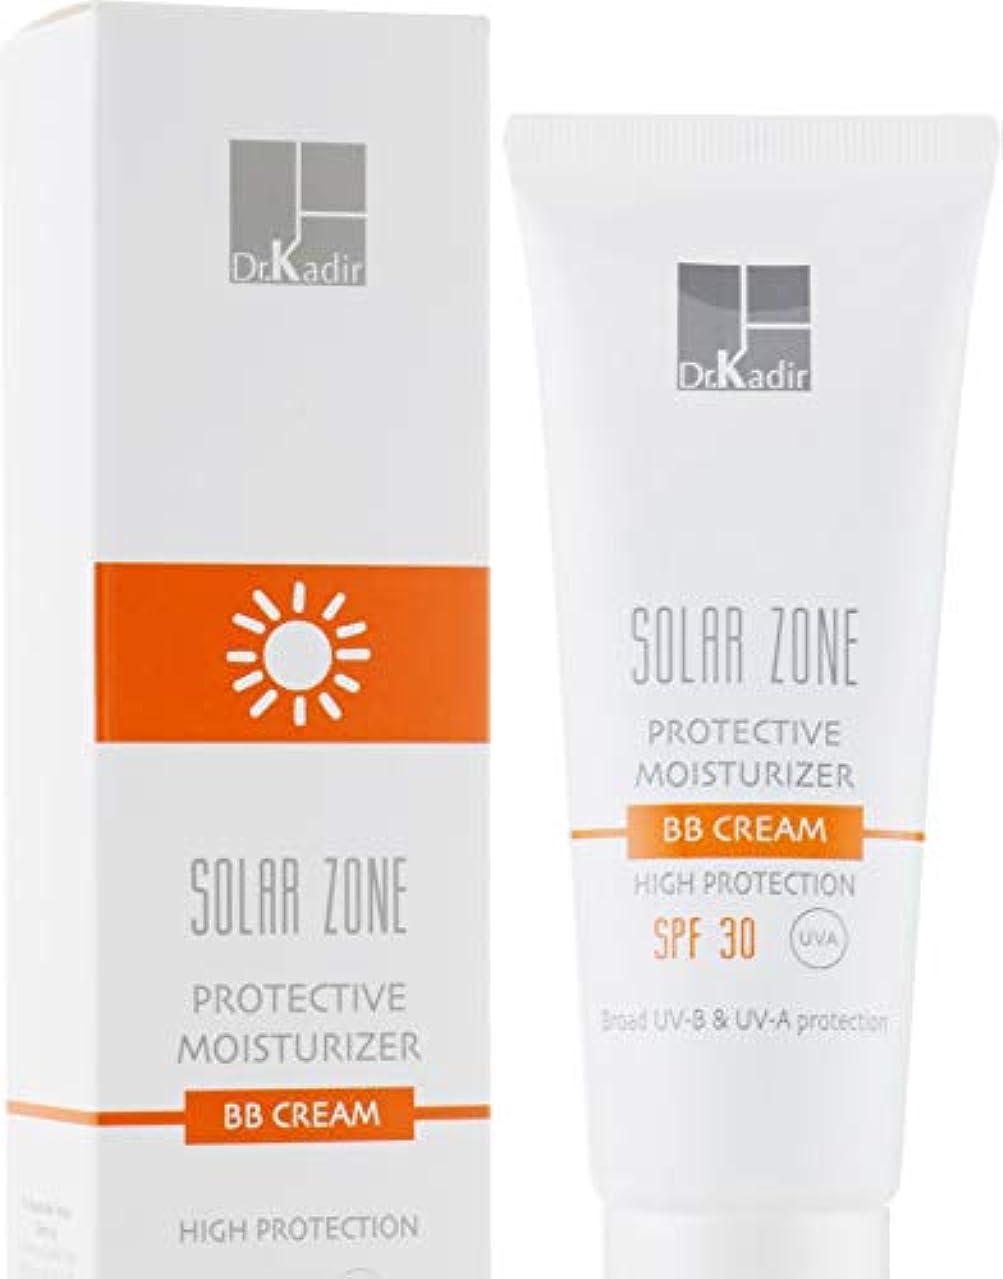 計画植物学者包囲Dr. Kadir Solar Zone Protective Moisturizer BB Cream SPF 30 75ml